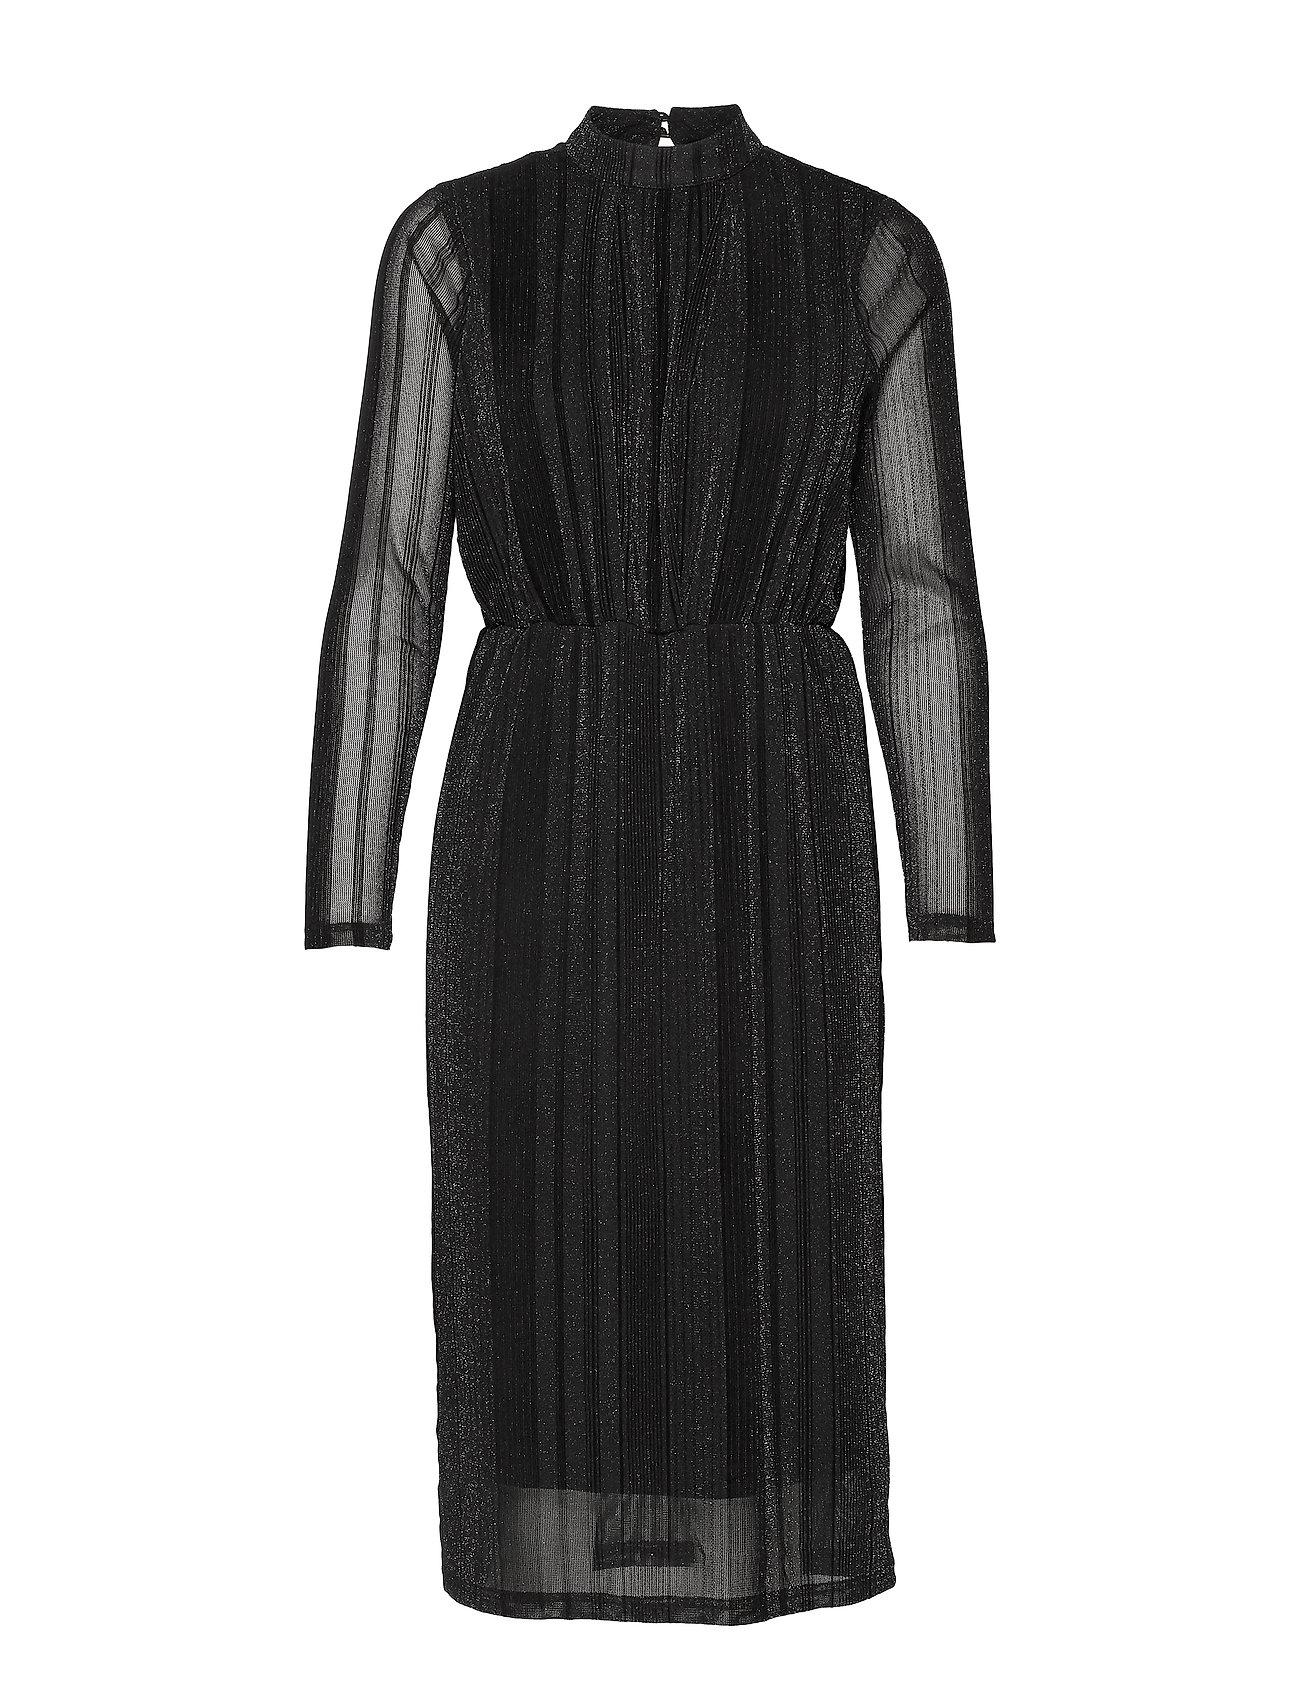 YAS YASDIANE LS DRESS- SHOW - BLACK